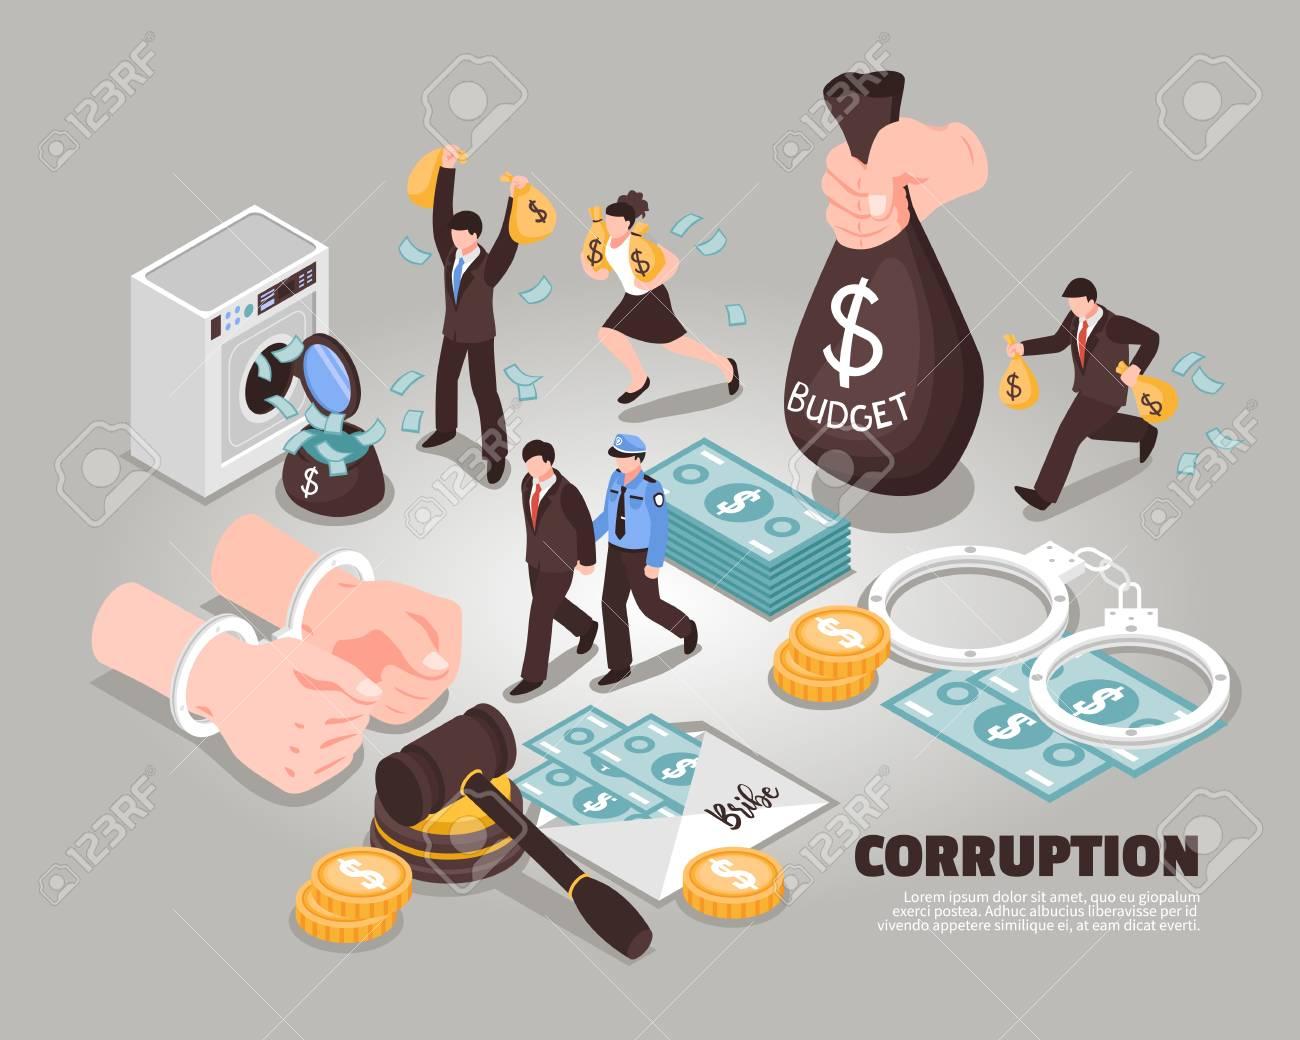 Corruption isometric vector illustration Included icons symbolizing laundering bribery embezzlement corrupt judge corrupt politician - 116212168